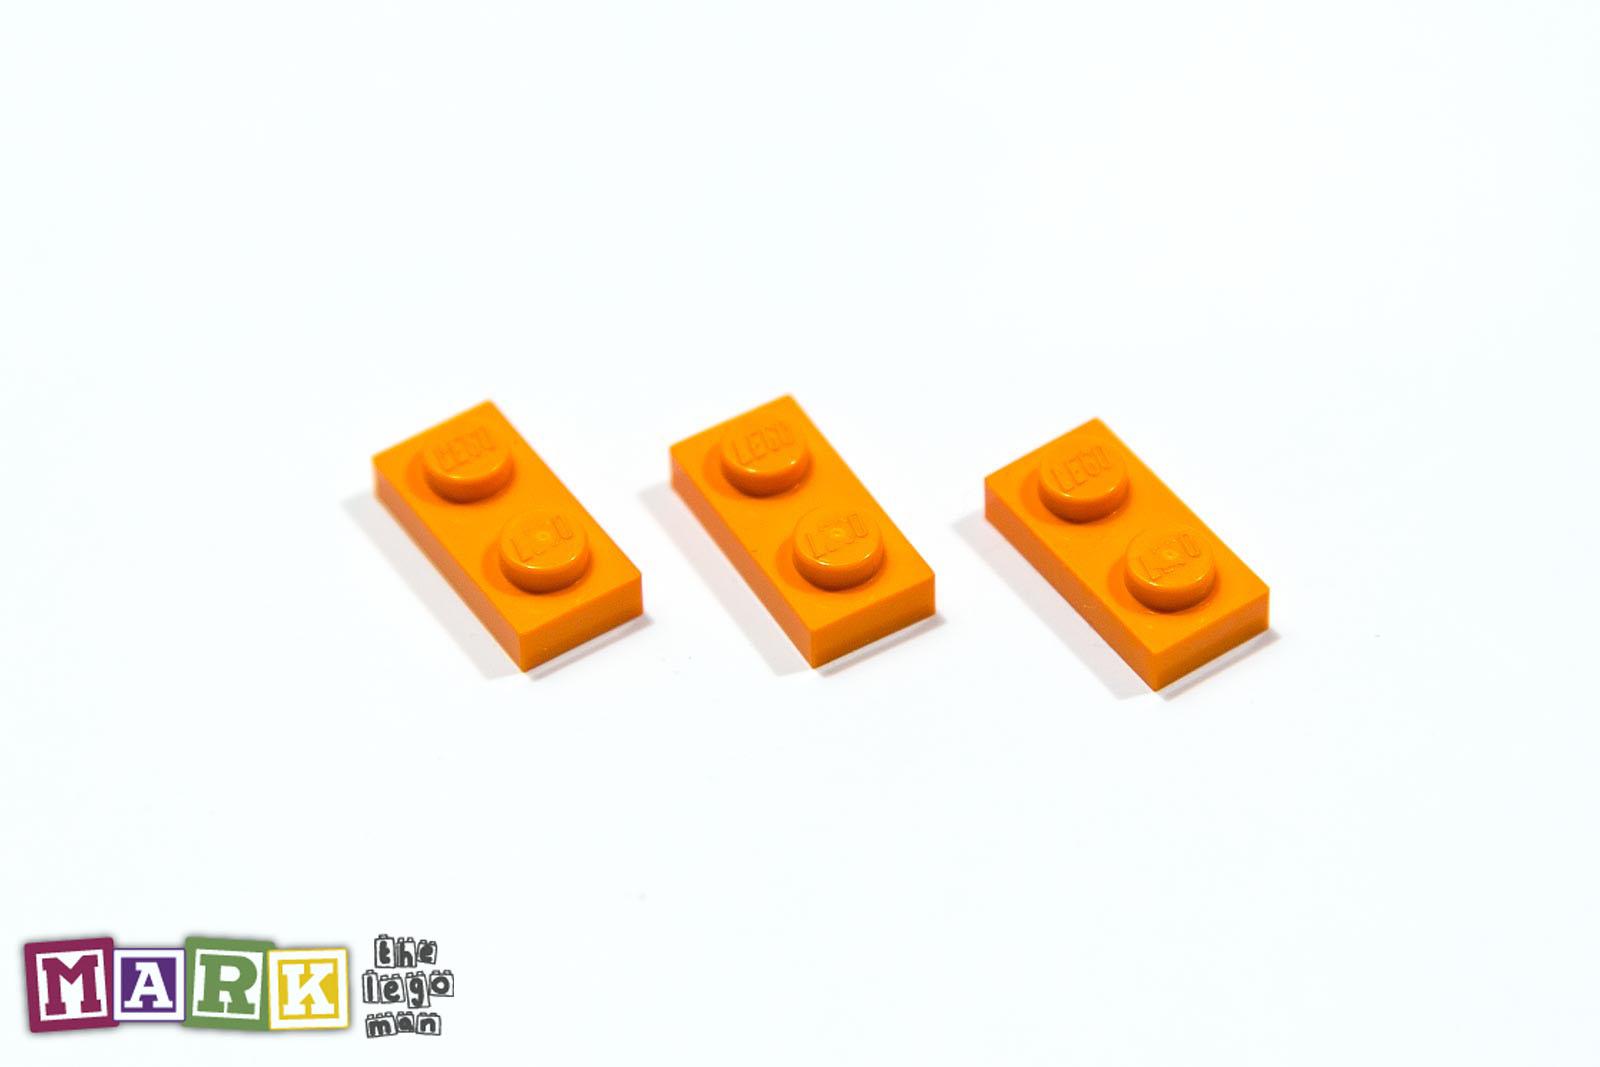 NEW Lego 4177932 3023 3x Bright Orange 1x2 Plate